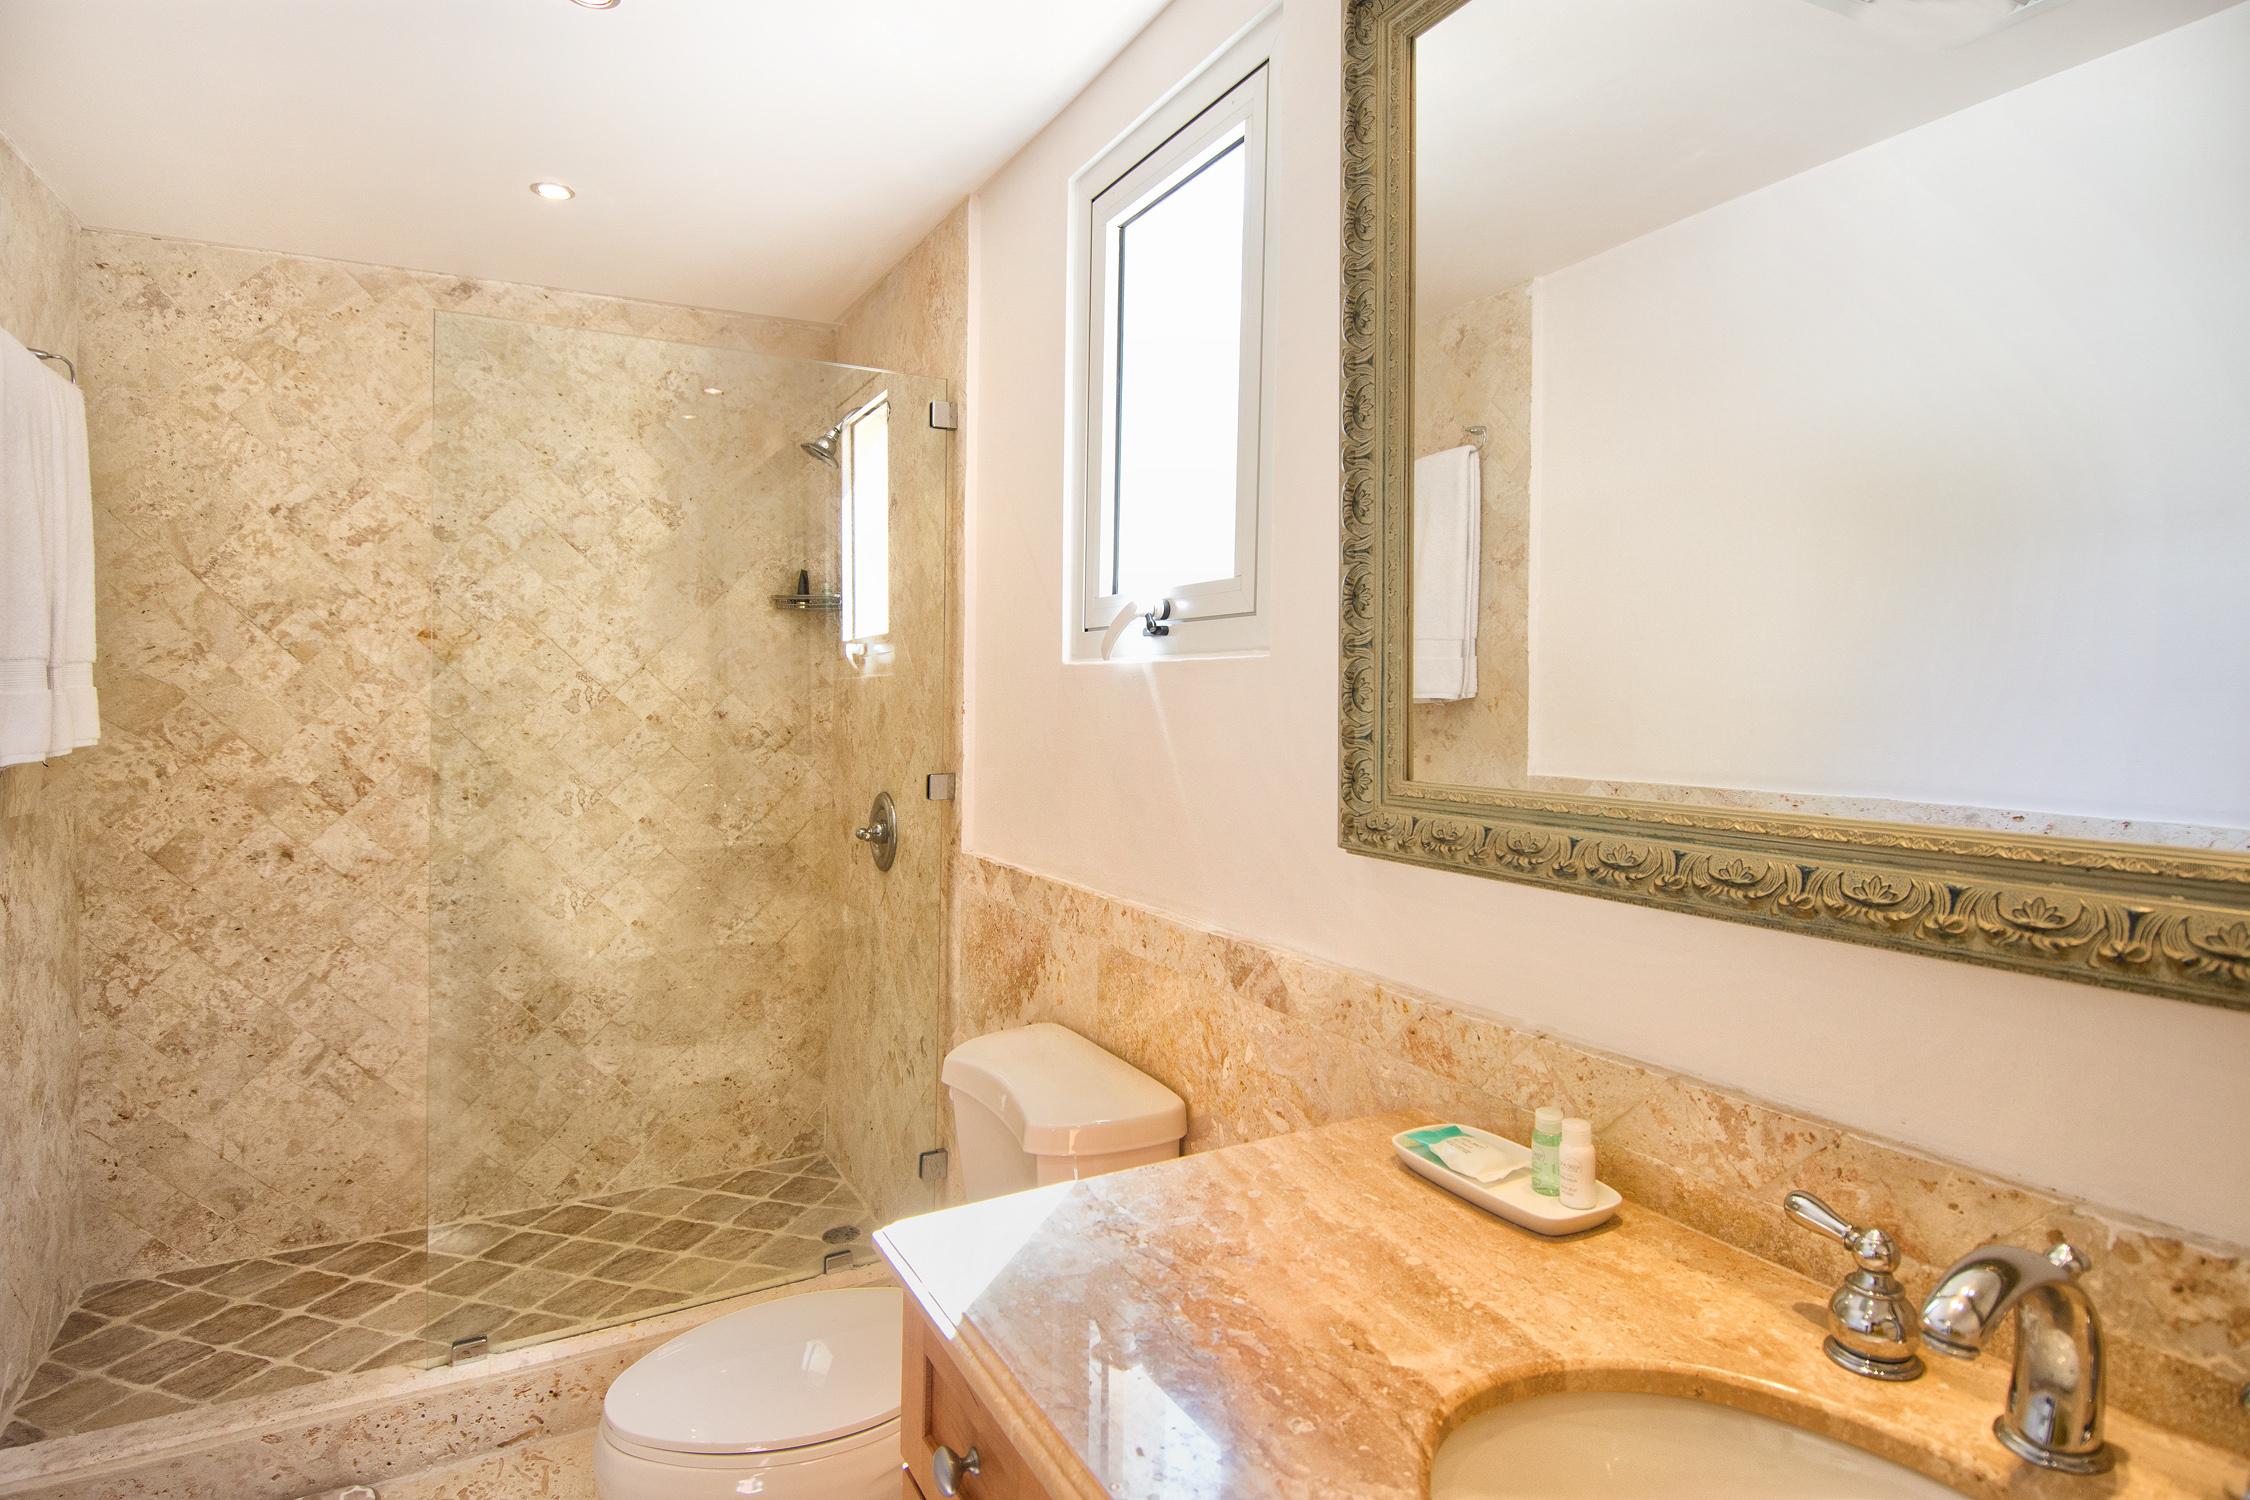 SM404 Bathroom #1